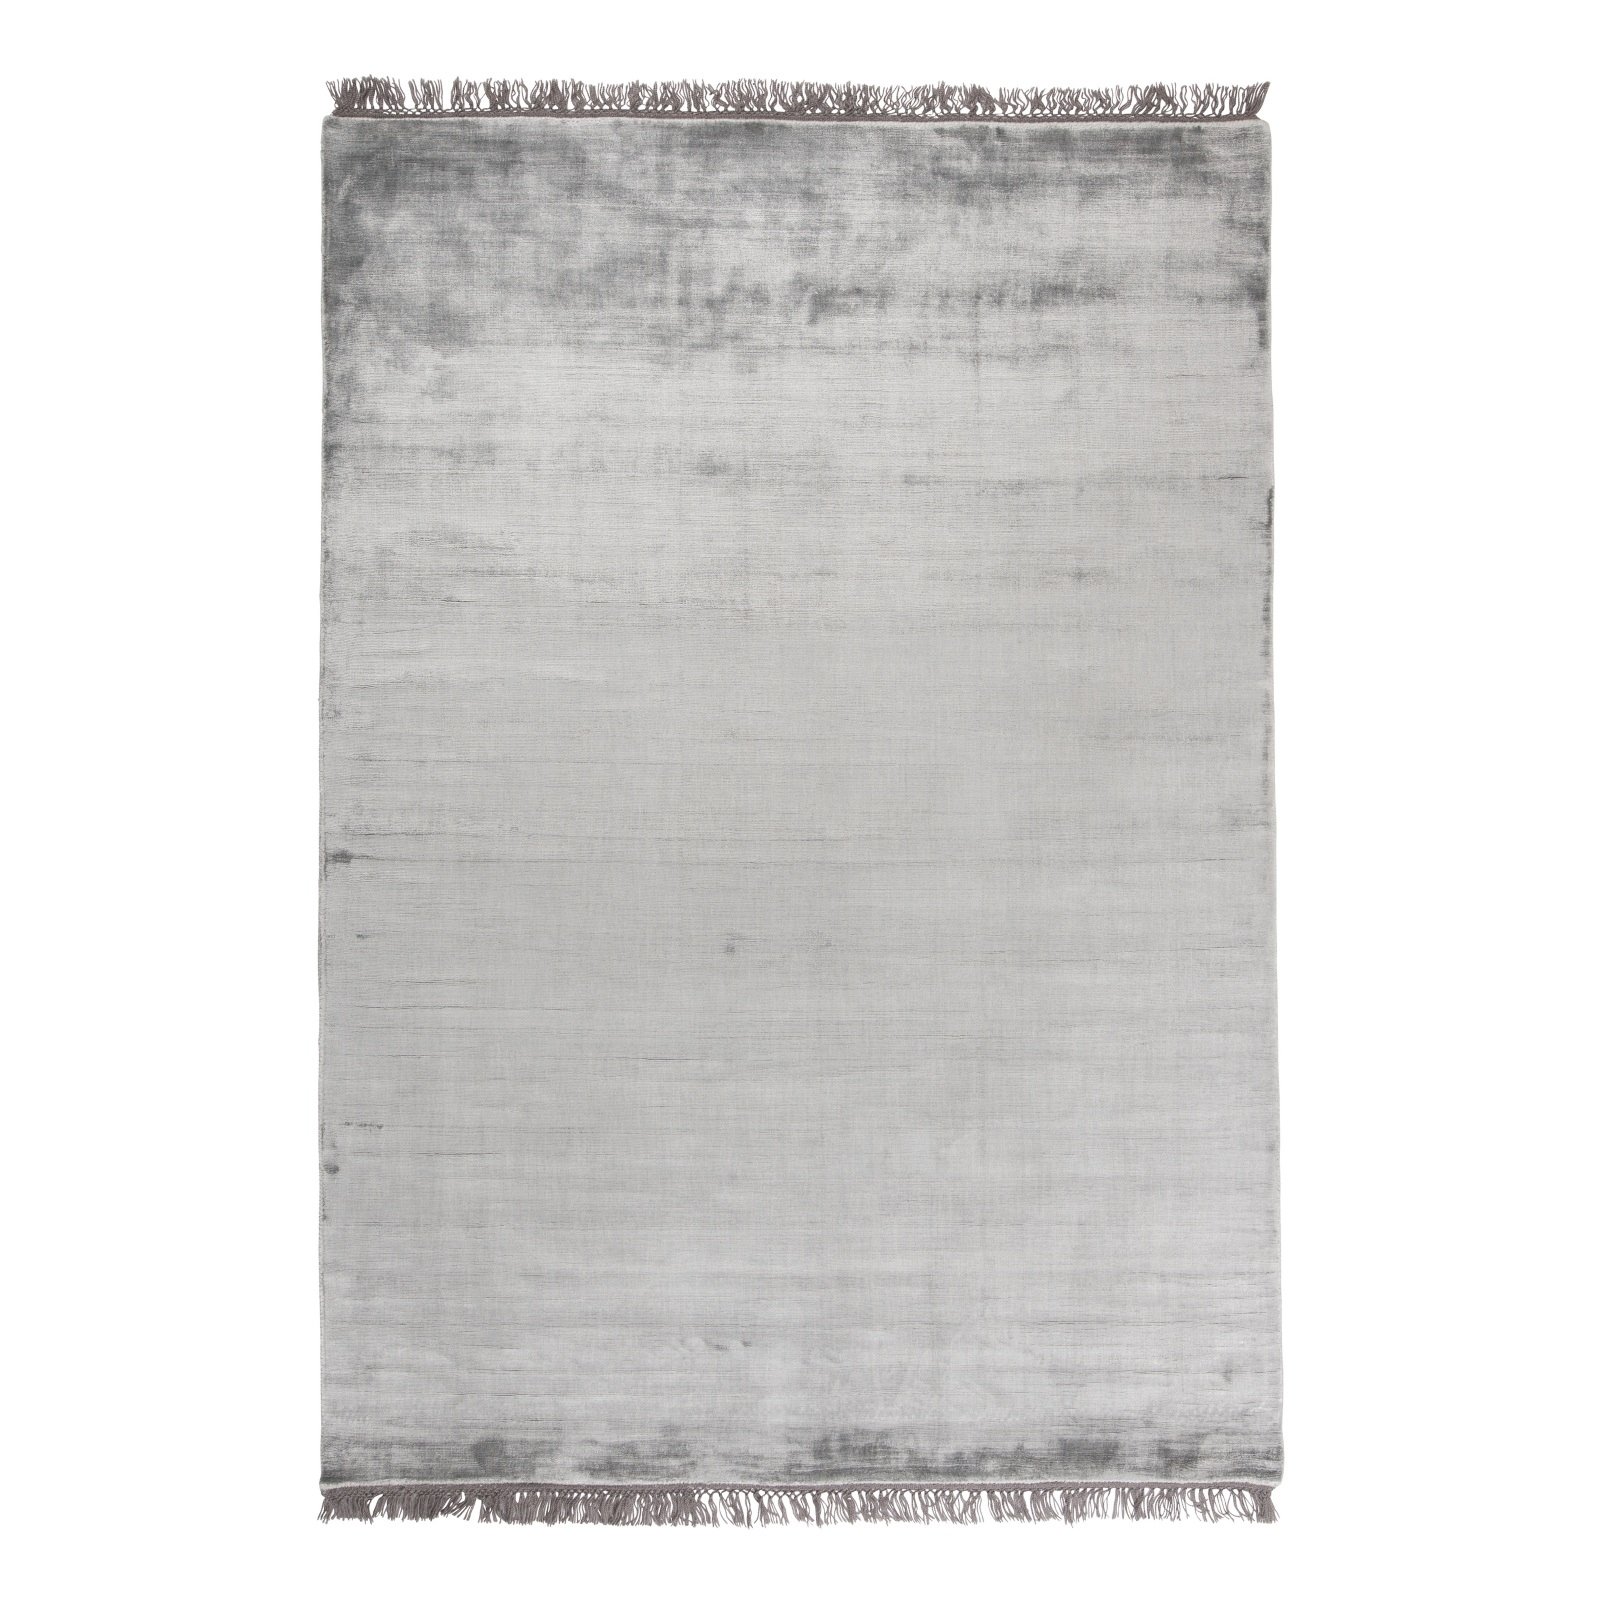 Viskosmatta ALMERIA 140 x 200 cm stone, Linie Design